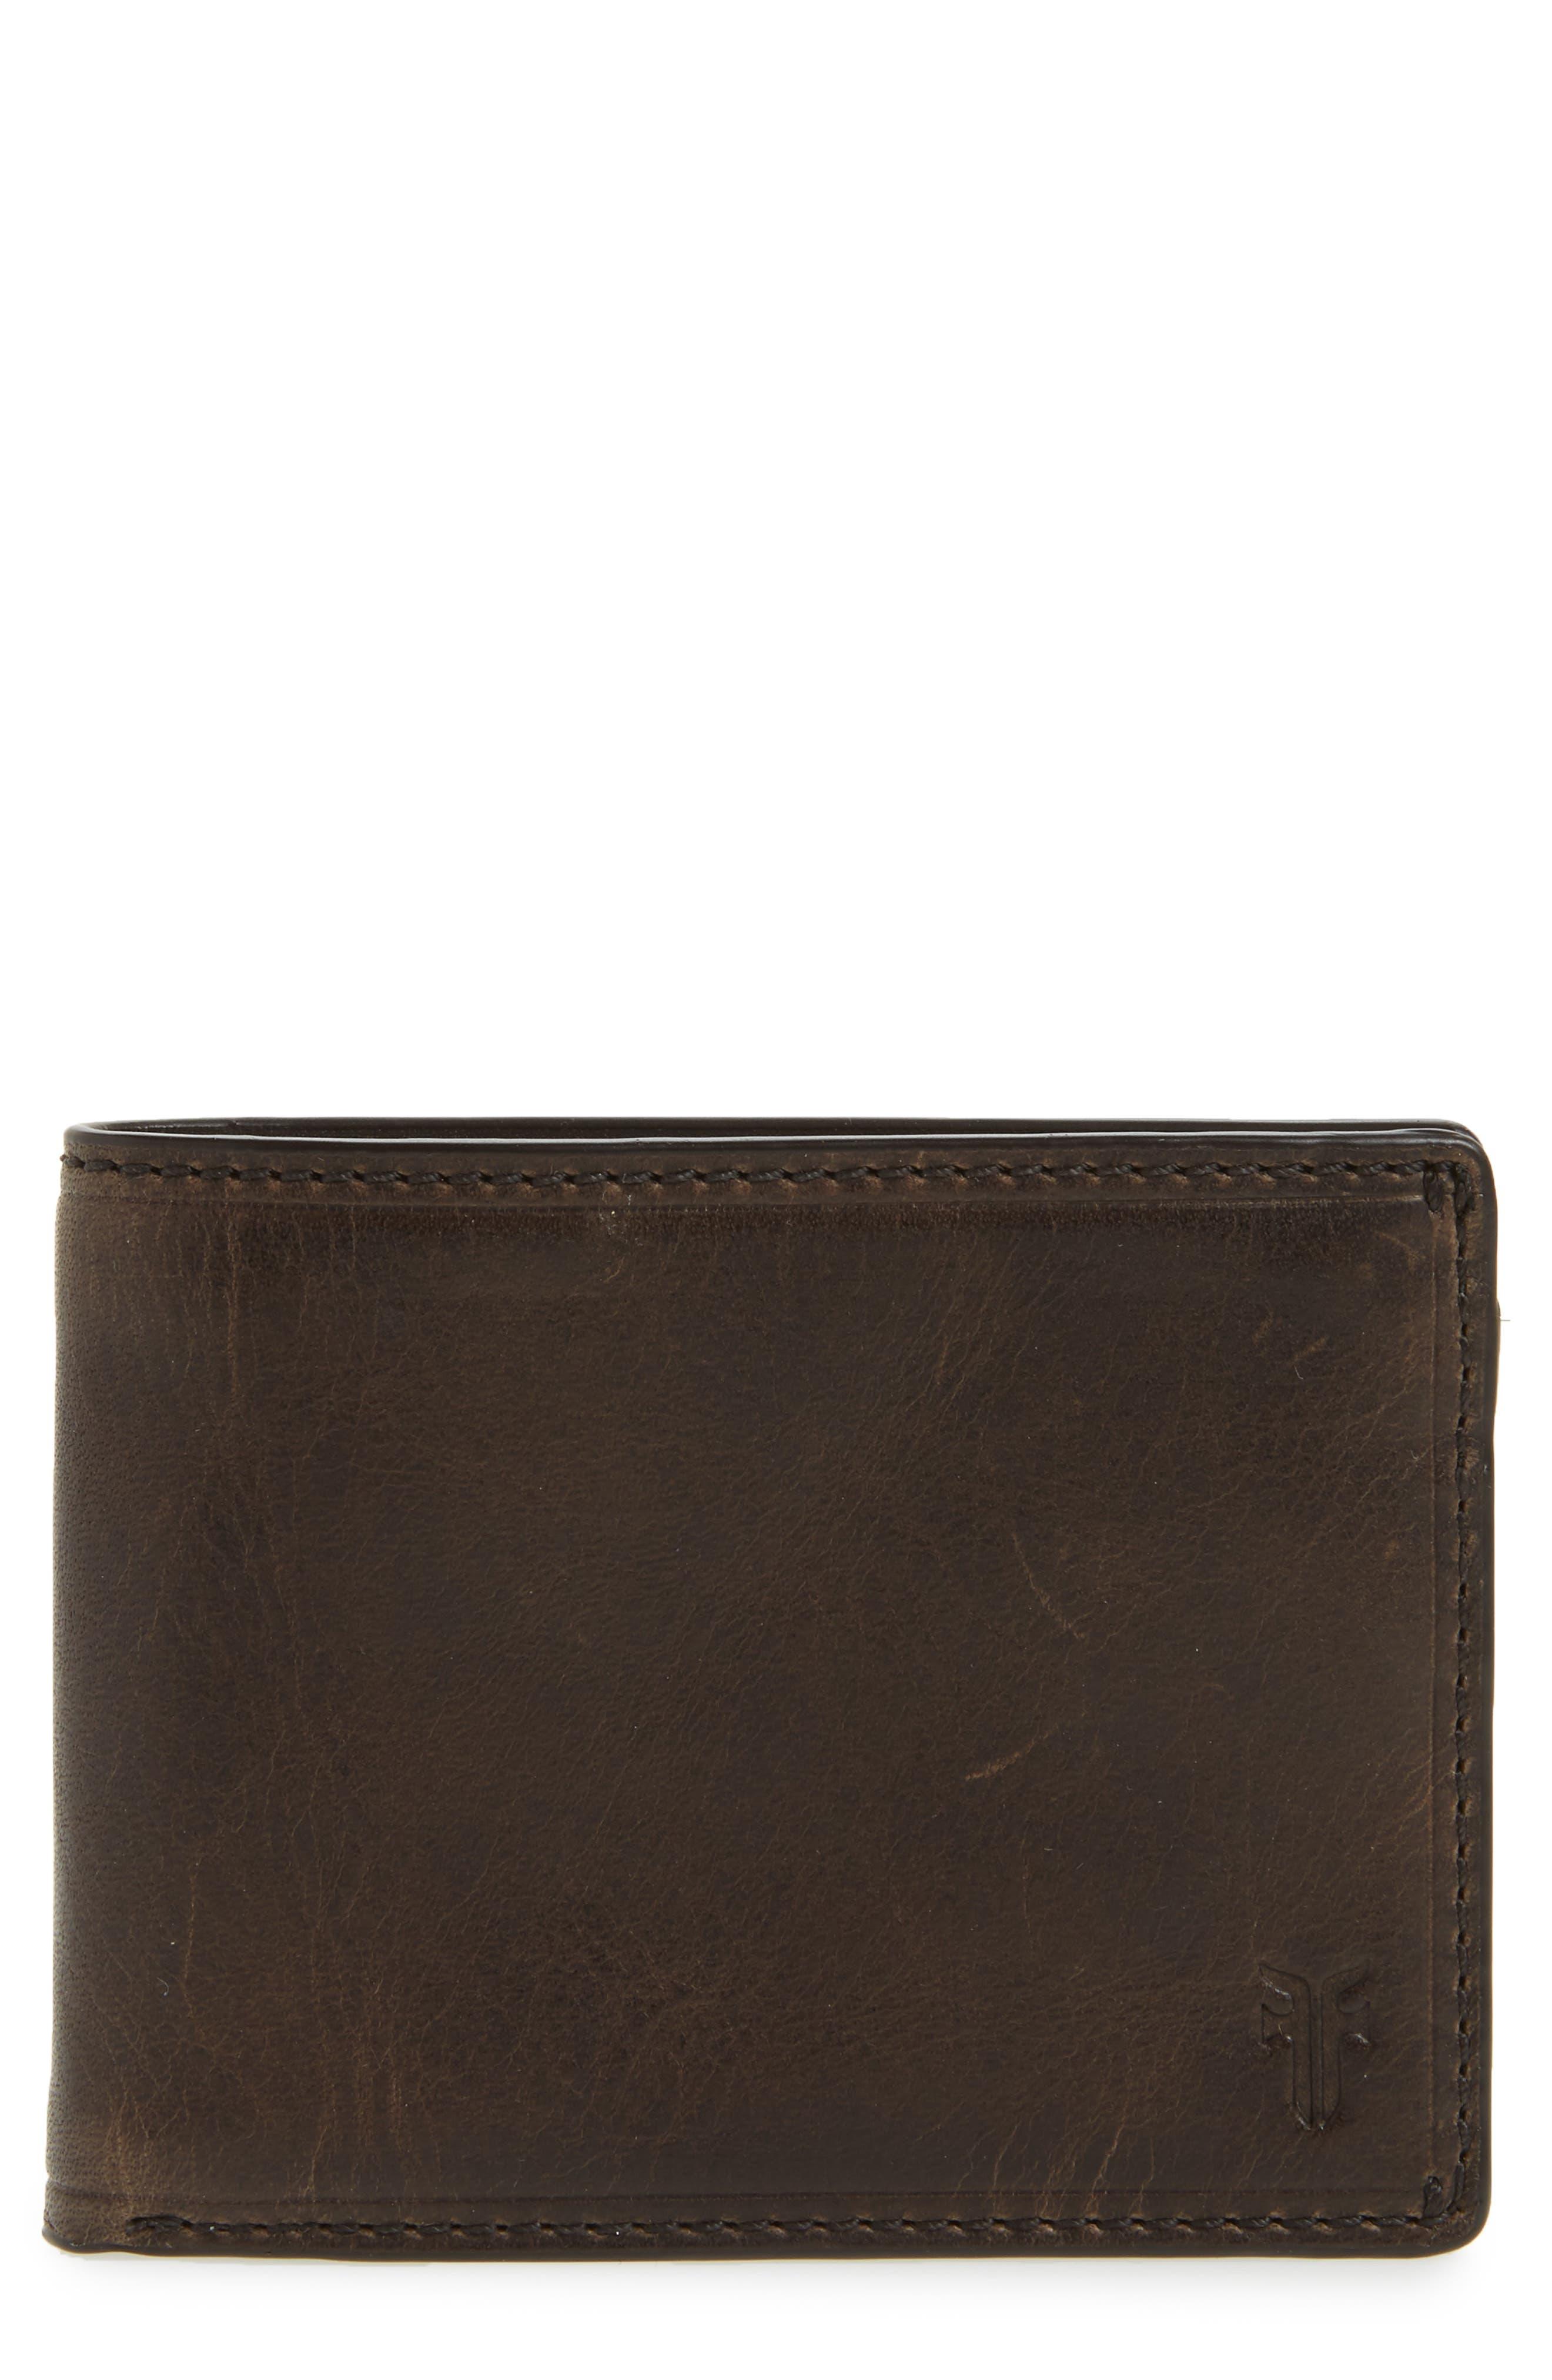 Main Image - Frye Logan Leather Wallet